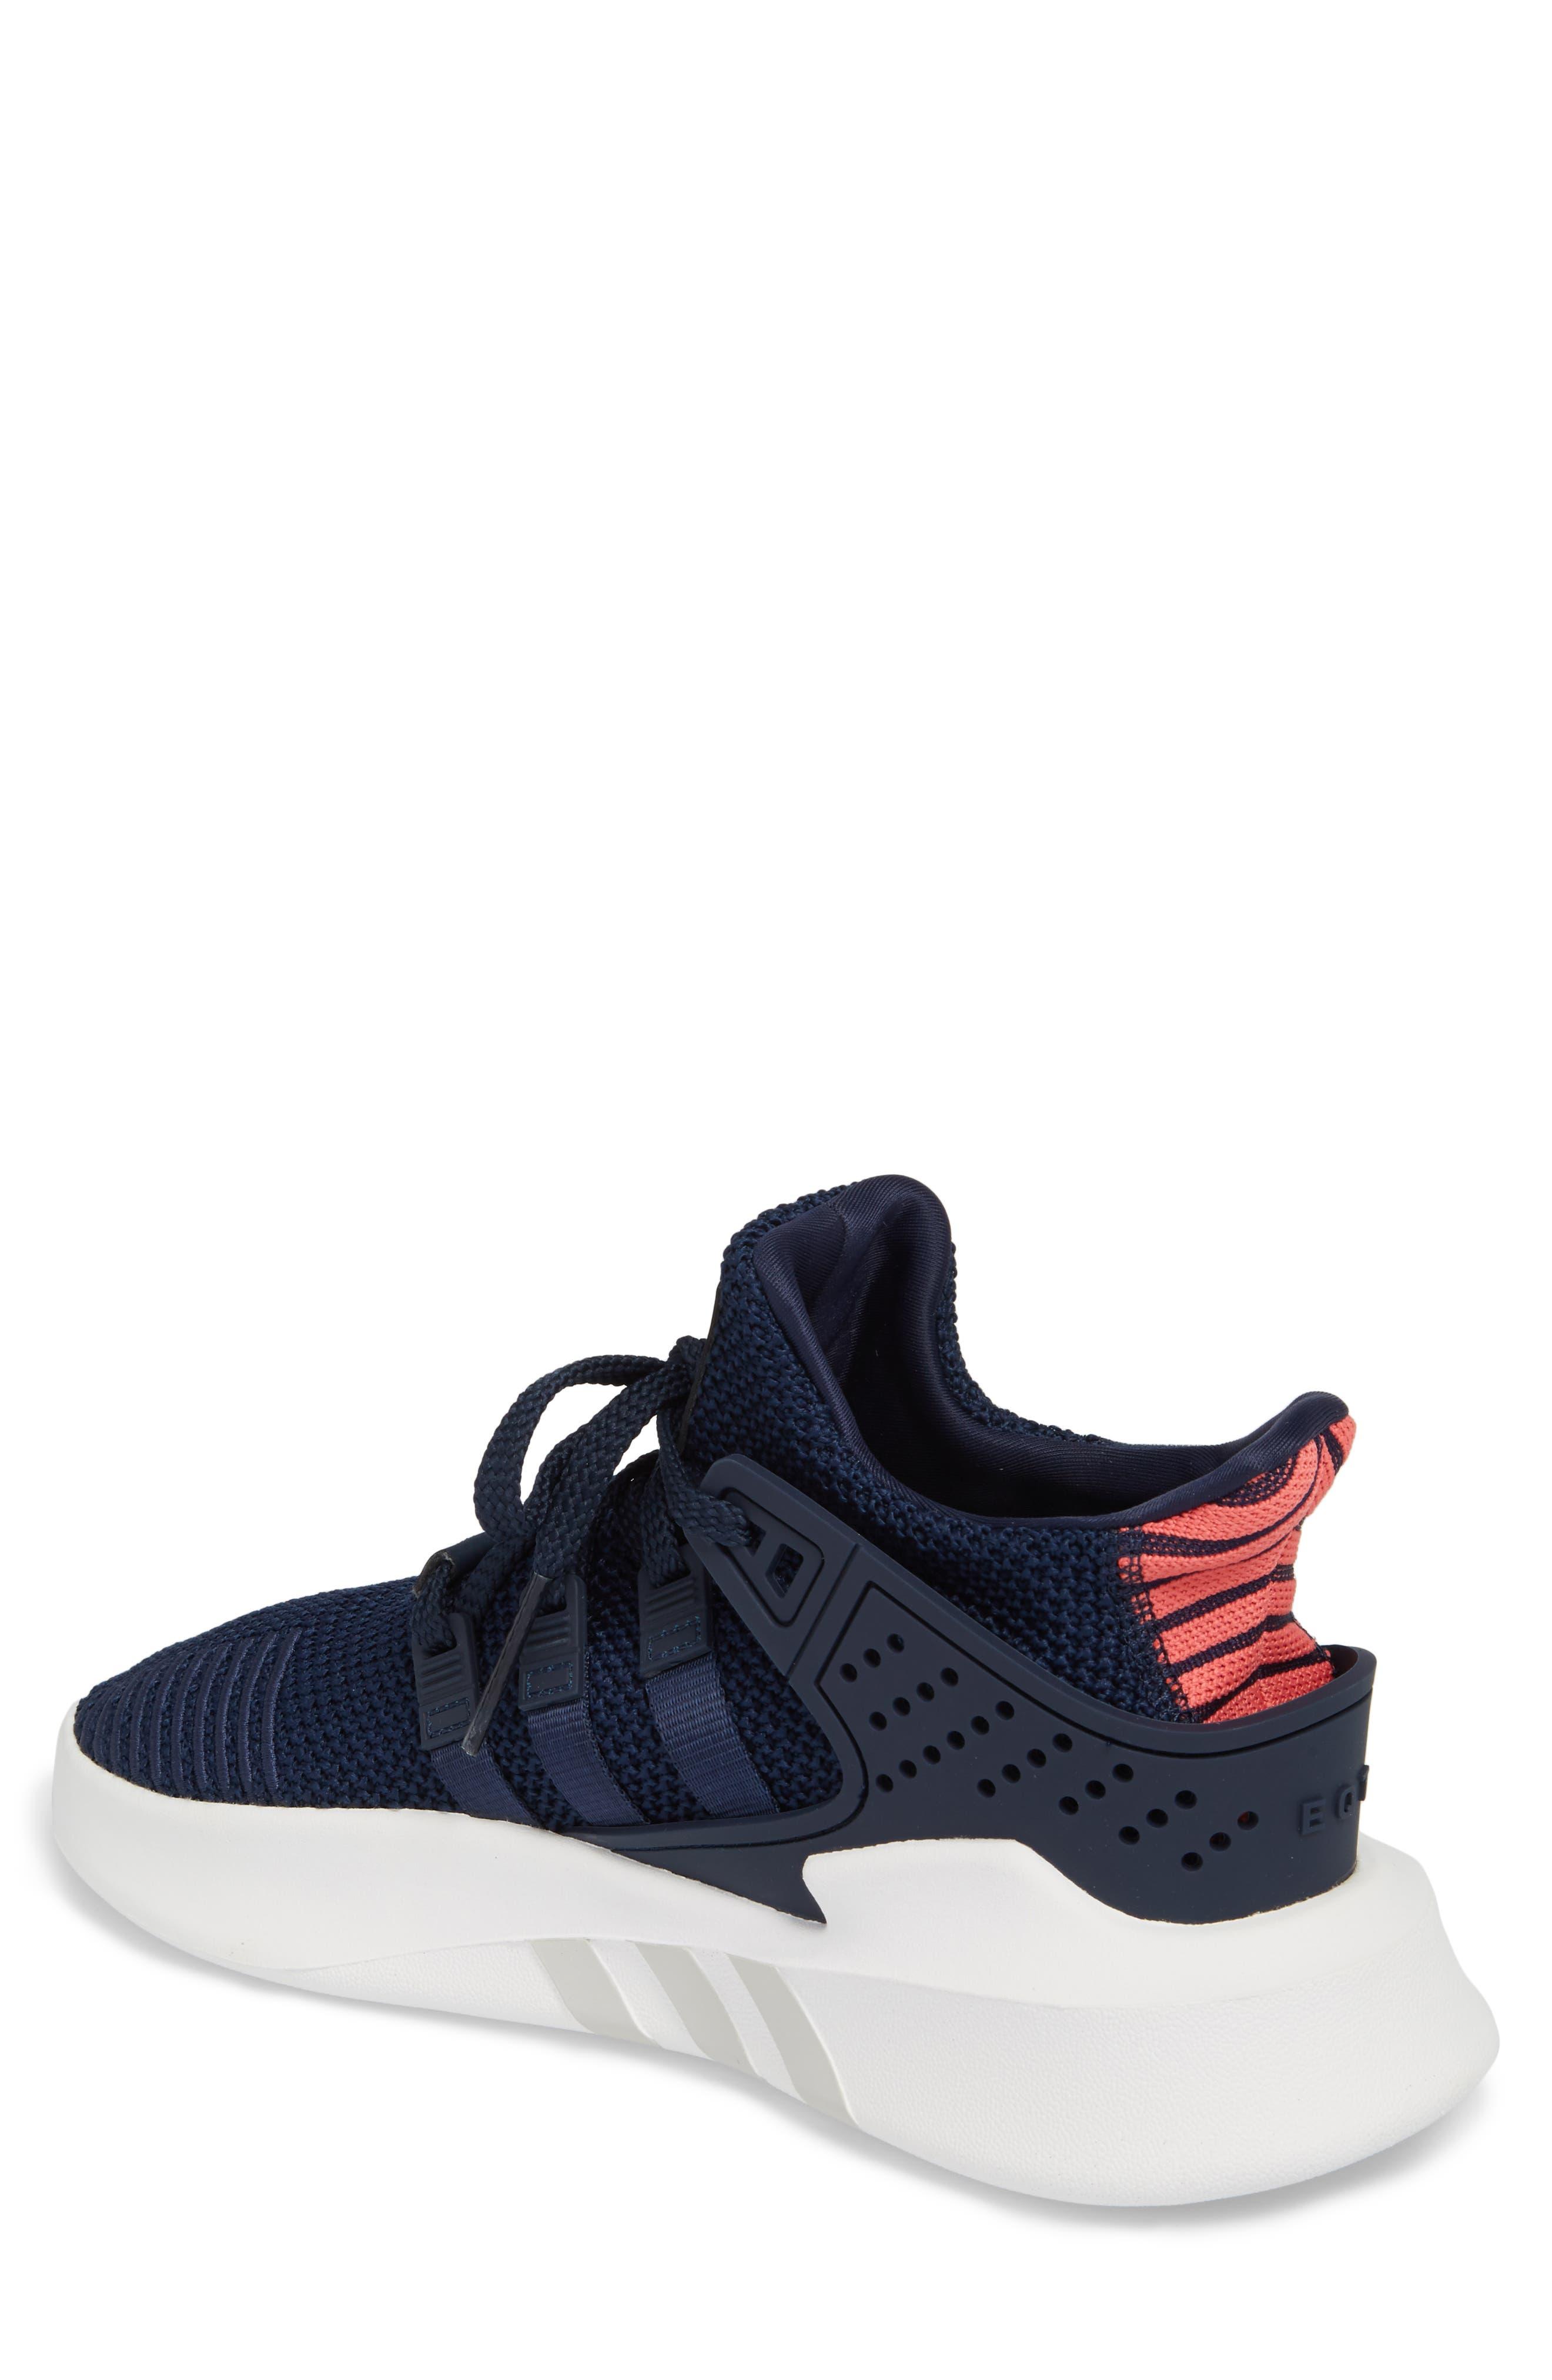 EQT Basketball ADV Sneaker,                             Alternate thumbnail 2, color,                             Collegiate Navy/ Real Coral